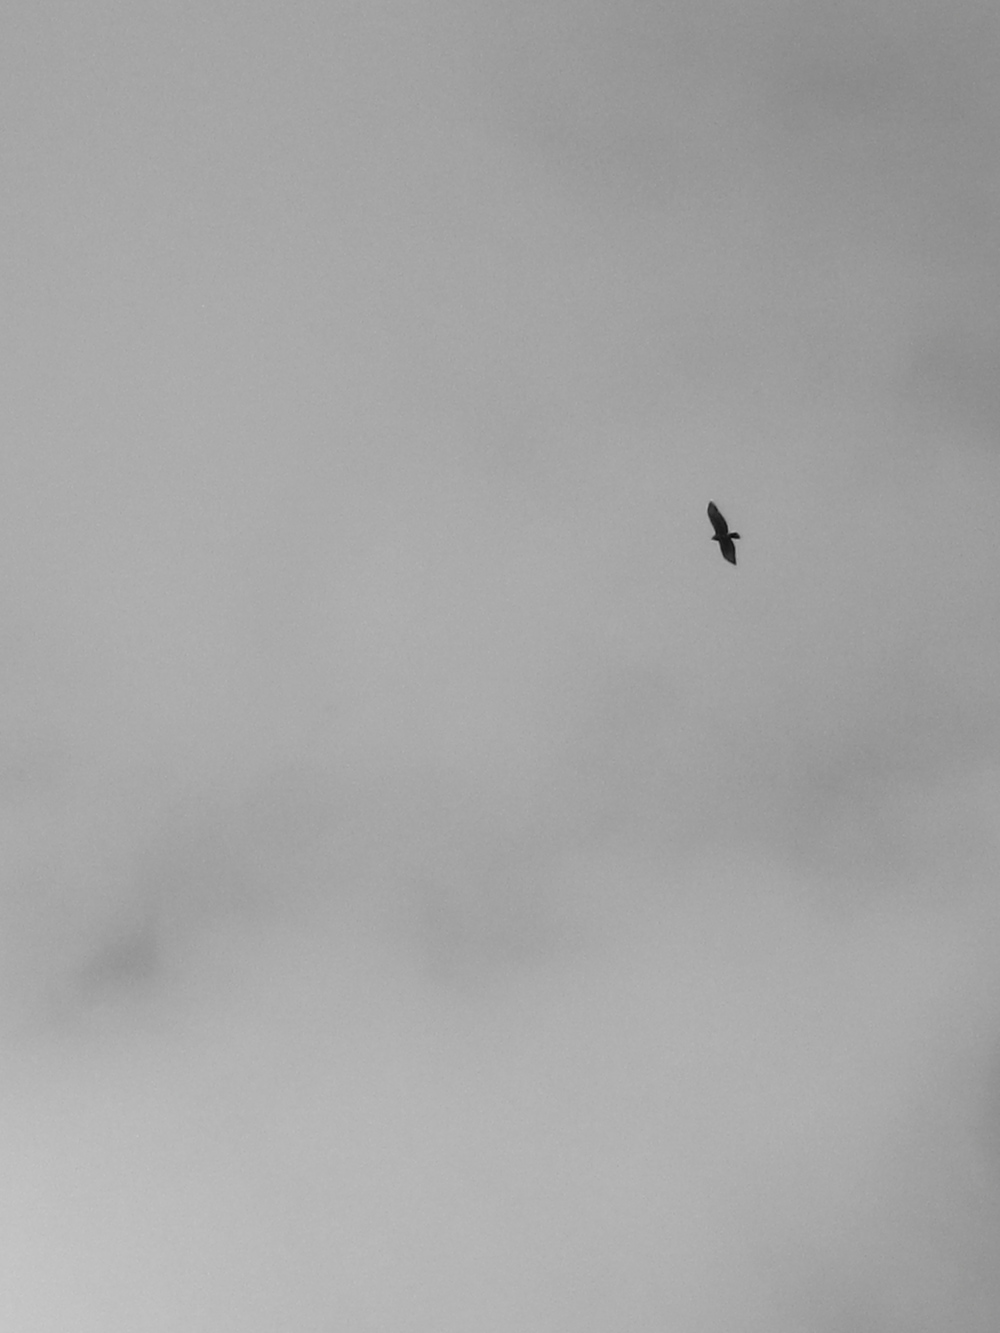 Bird of prey in the grey skies.